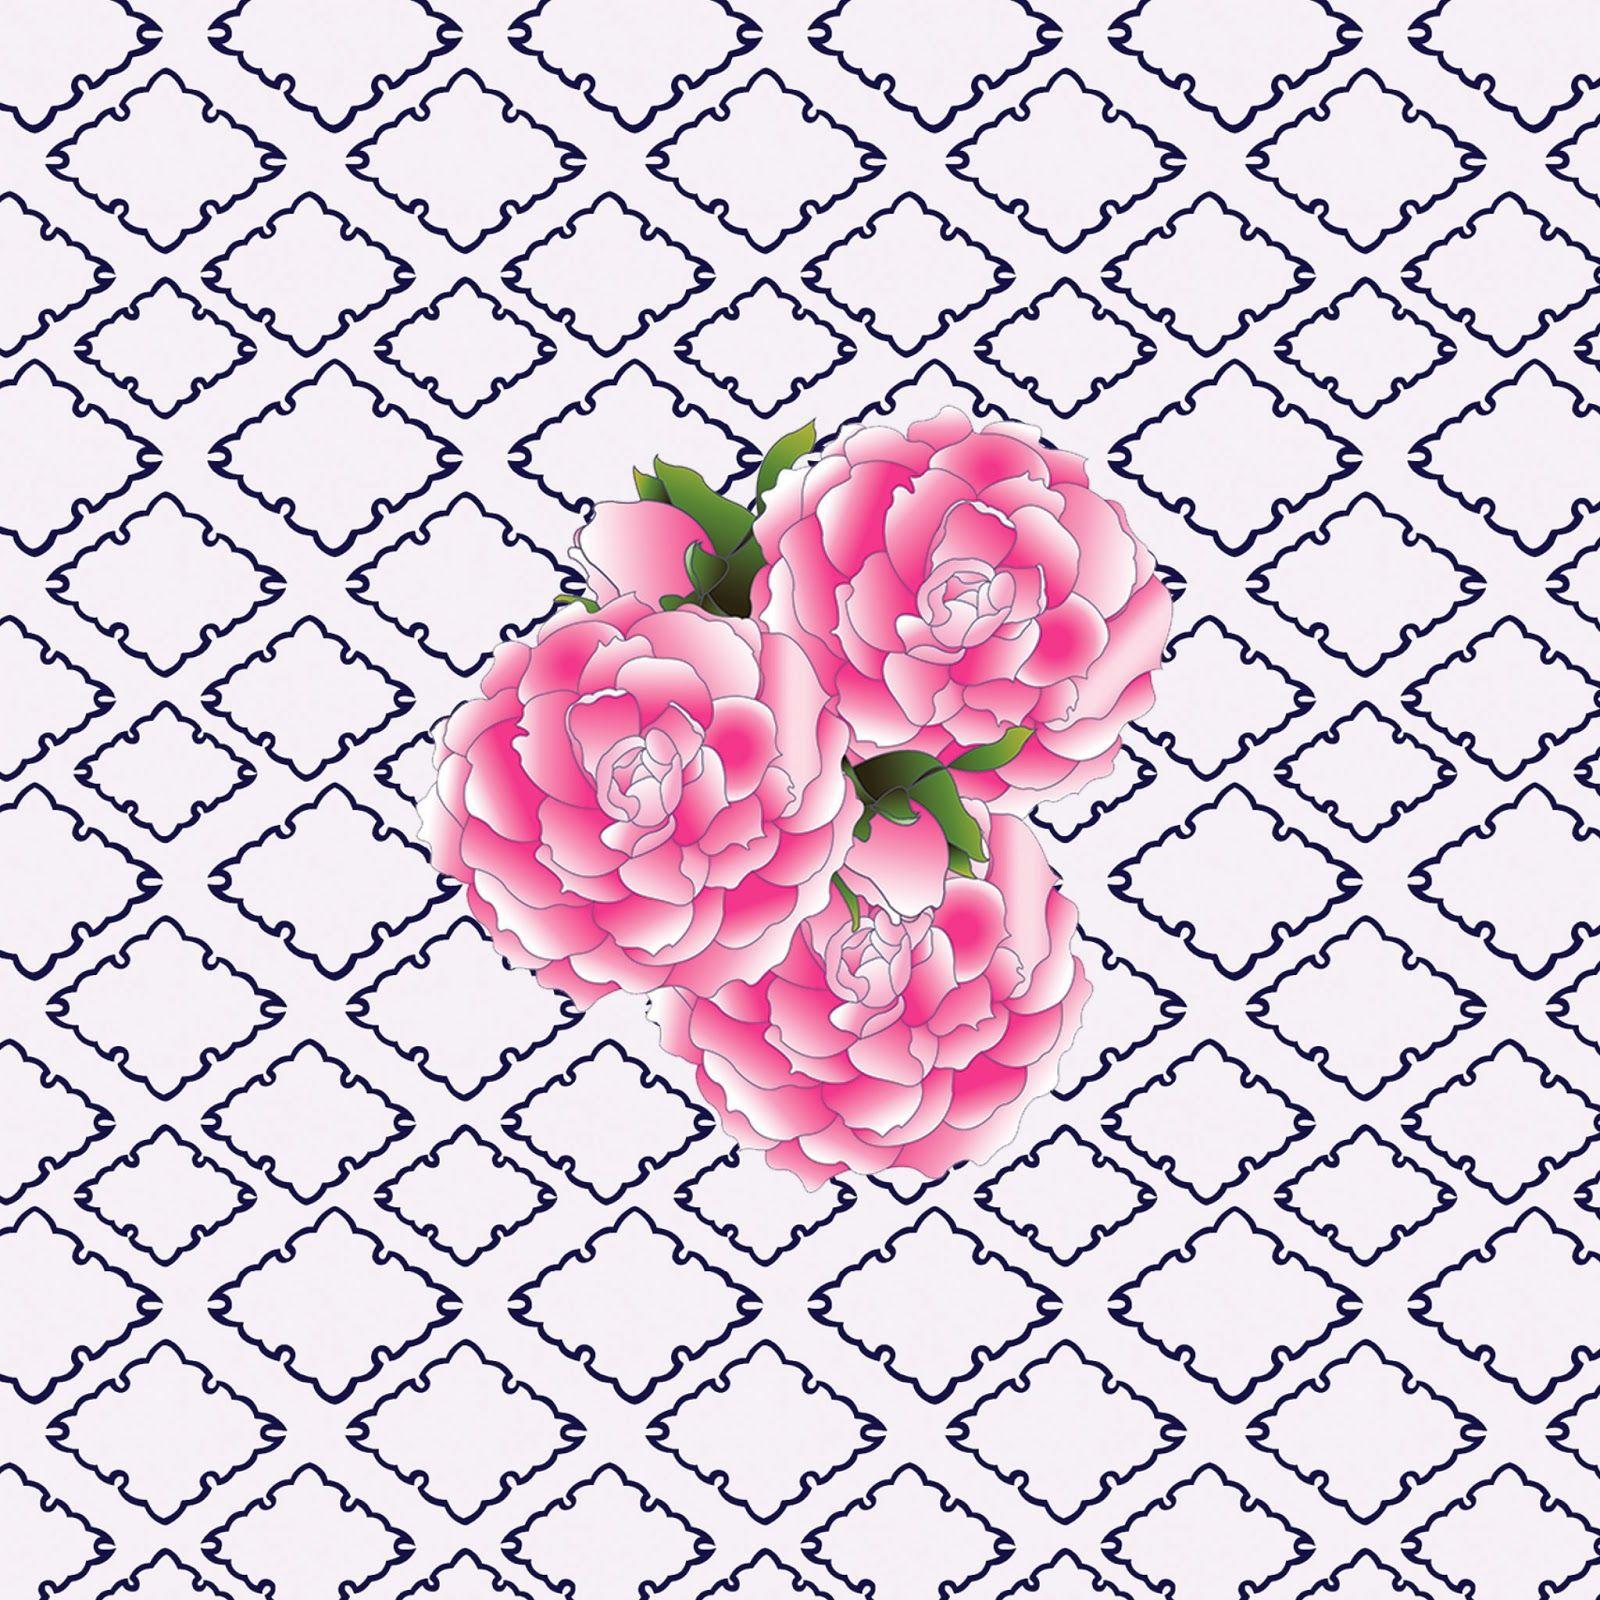 Cell Wallpaper Hd Illustration Fall Kate Spade Wallpaper Google Search Wallpaper